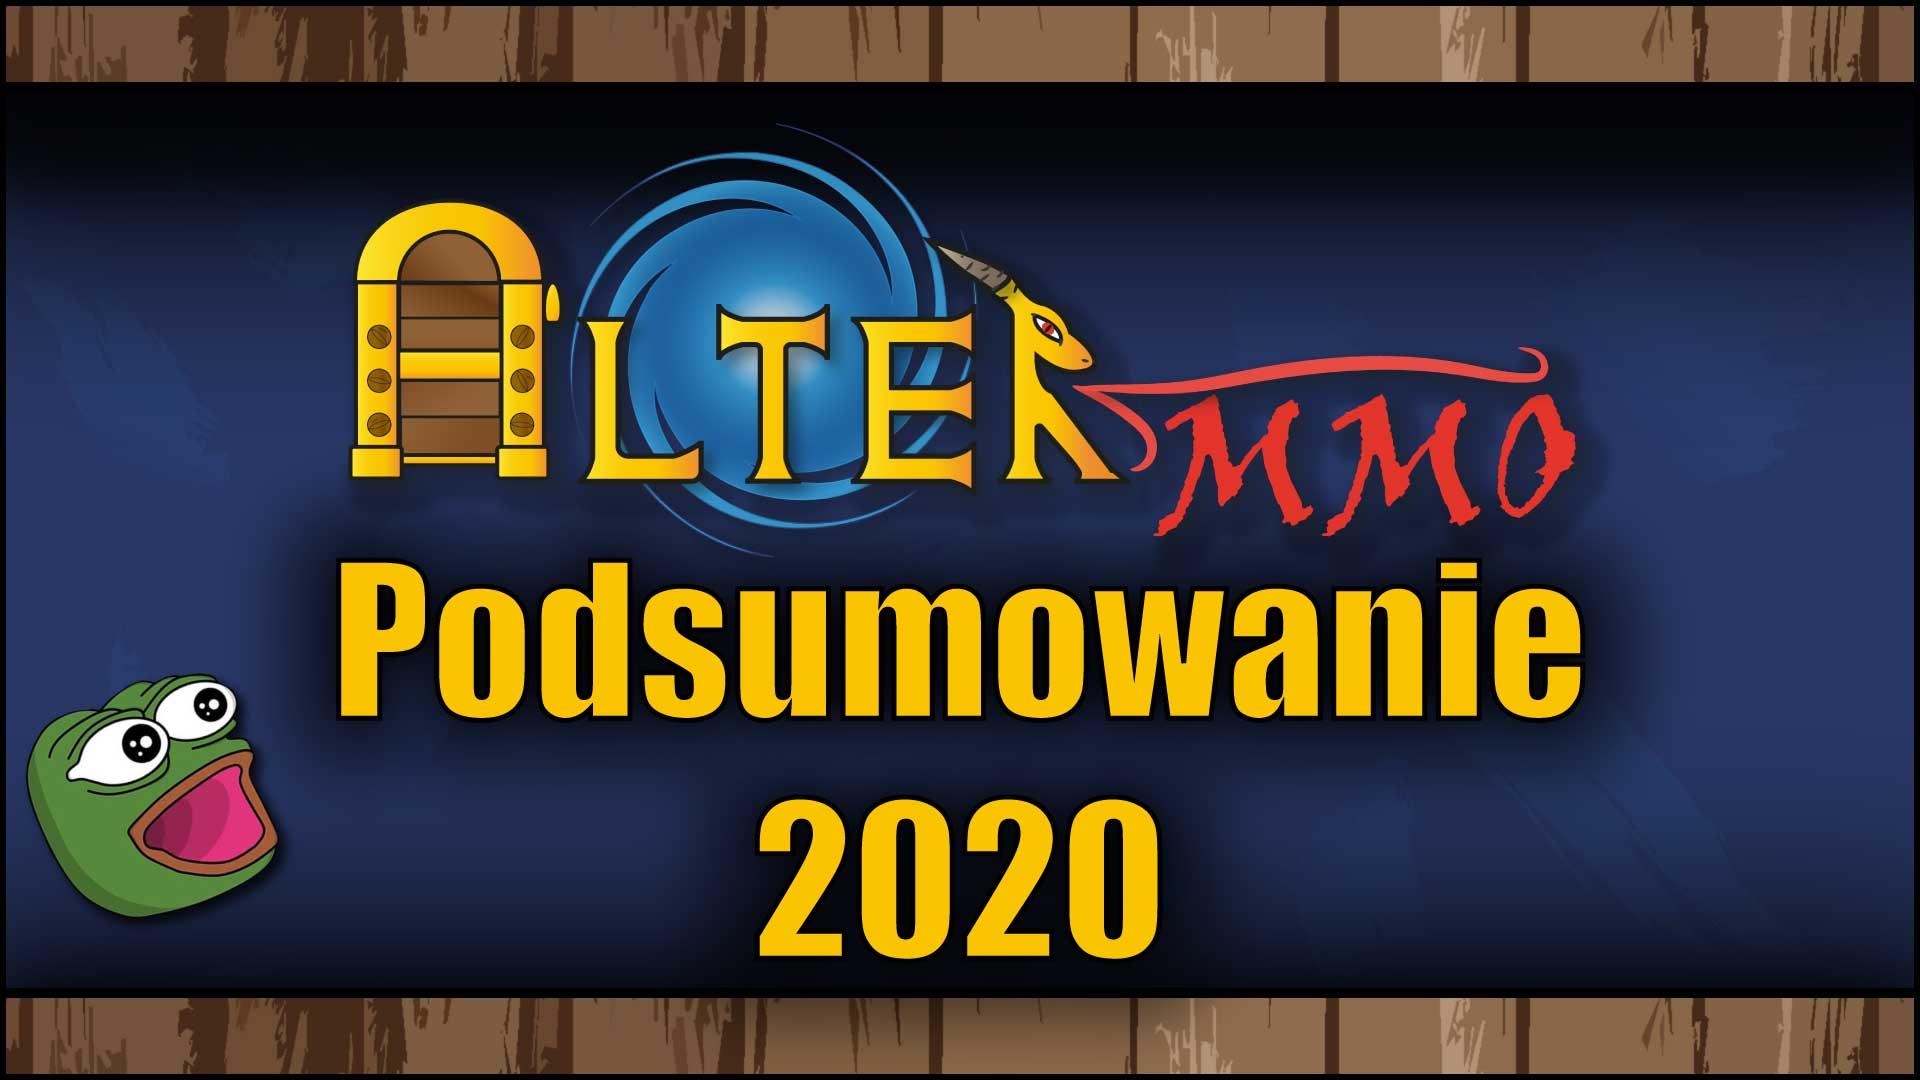 Altermmo MMORPG podsumowanie roku 2020